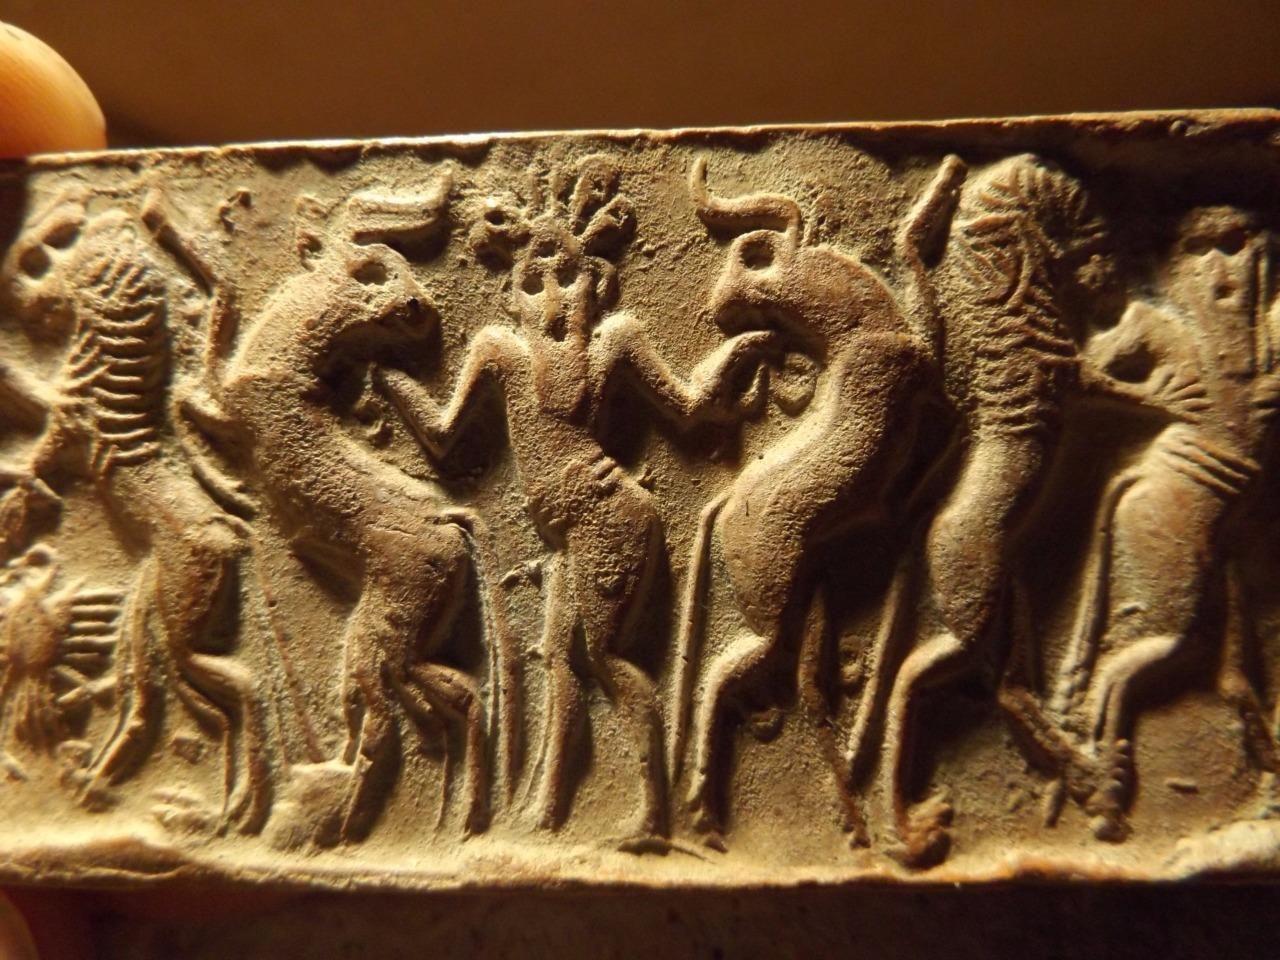 Sumerian cylinder seal impression - Master of animals. Museum replica.